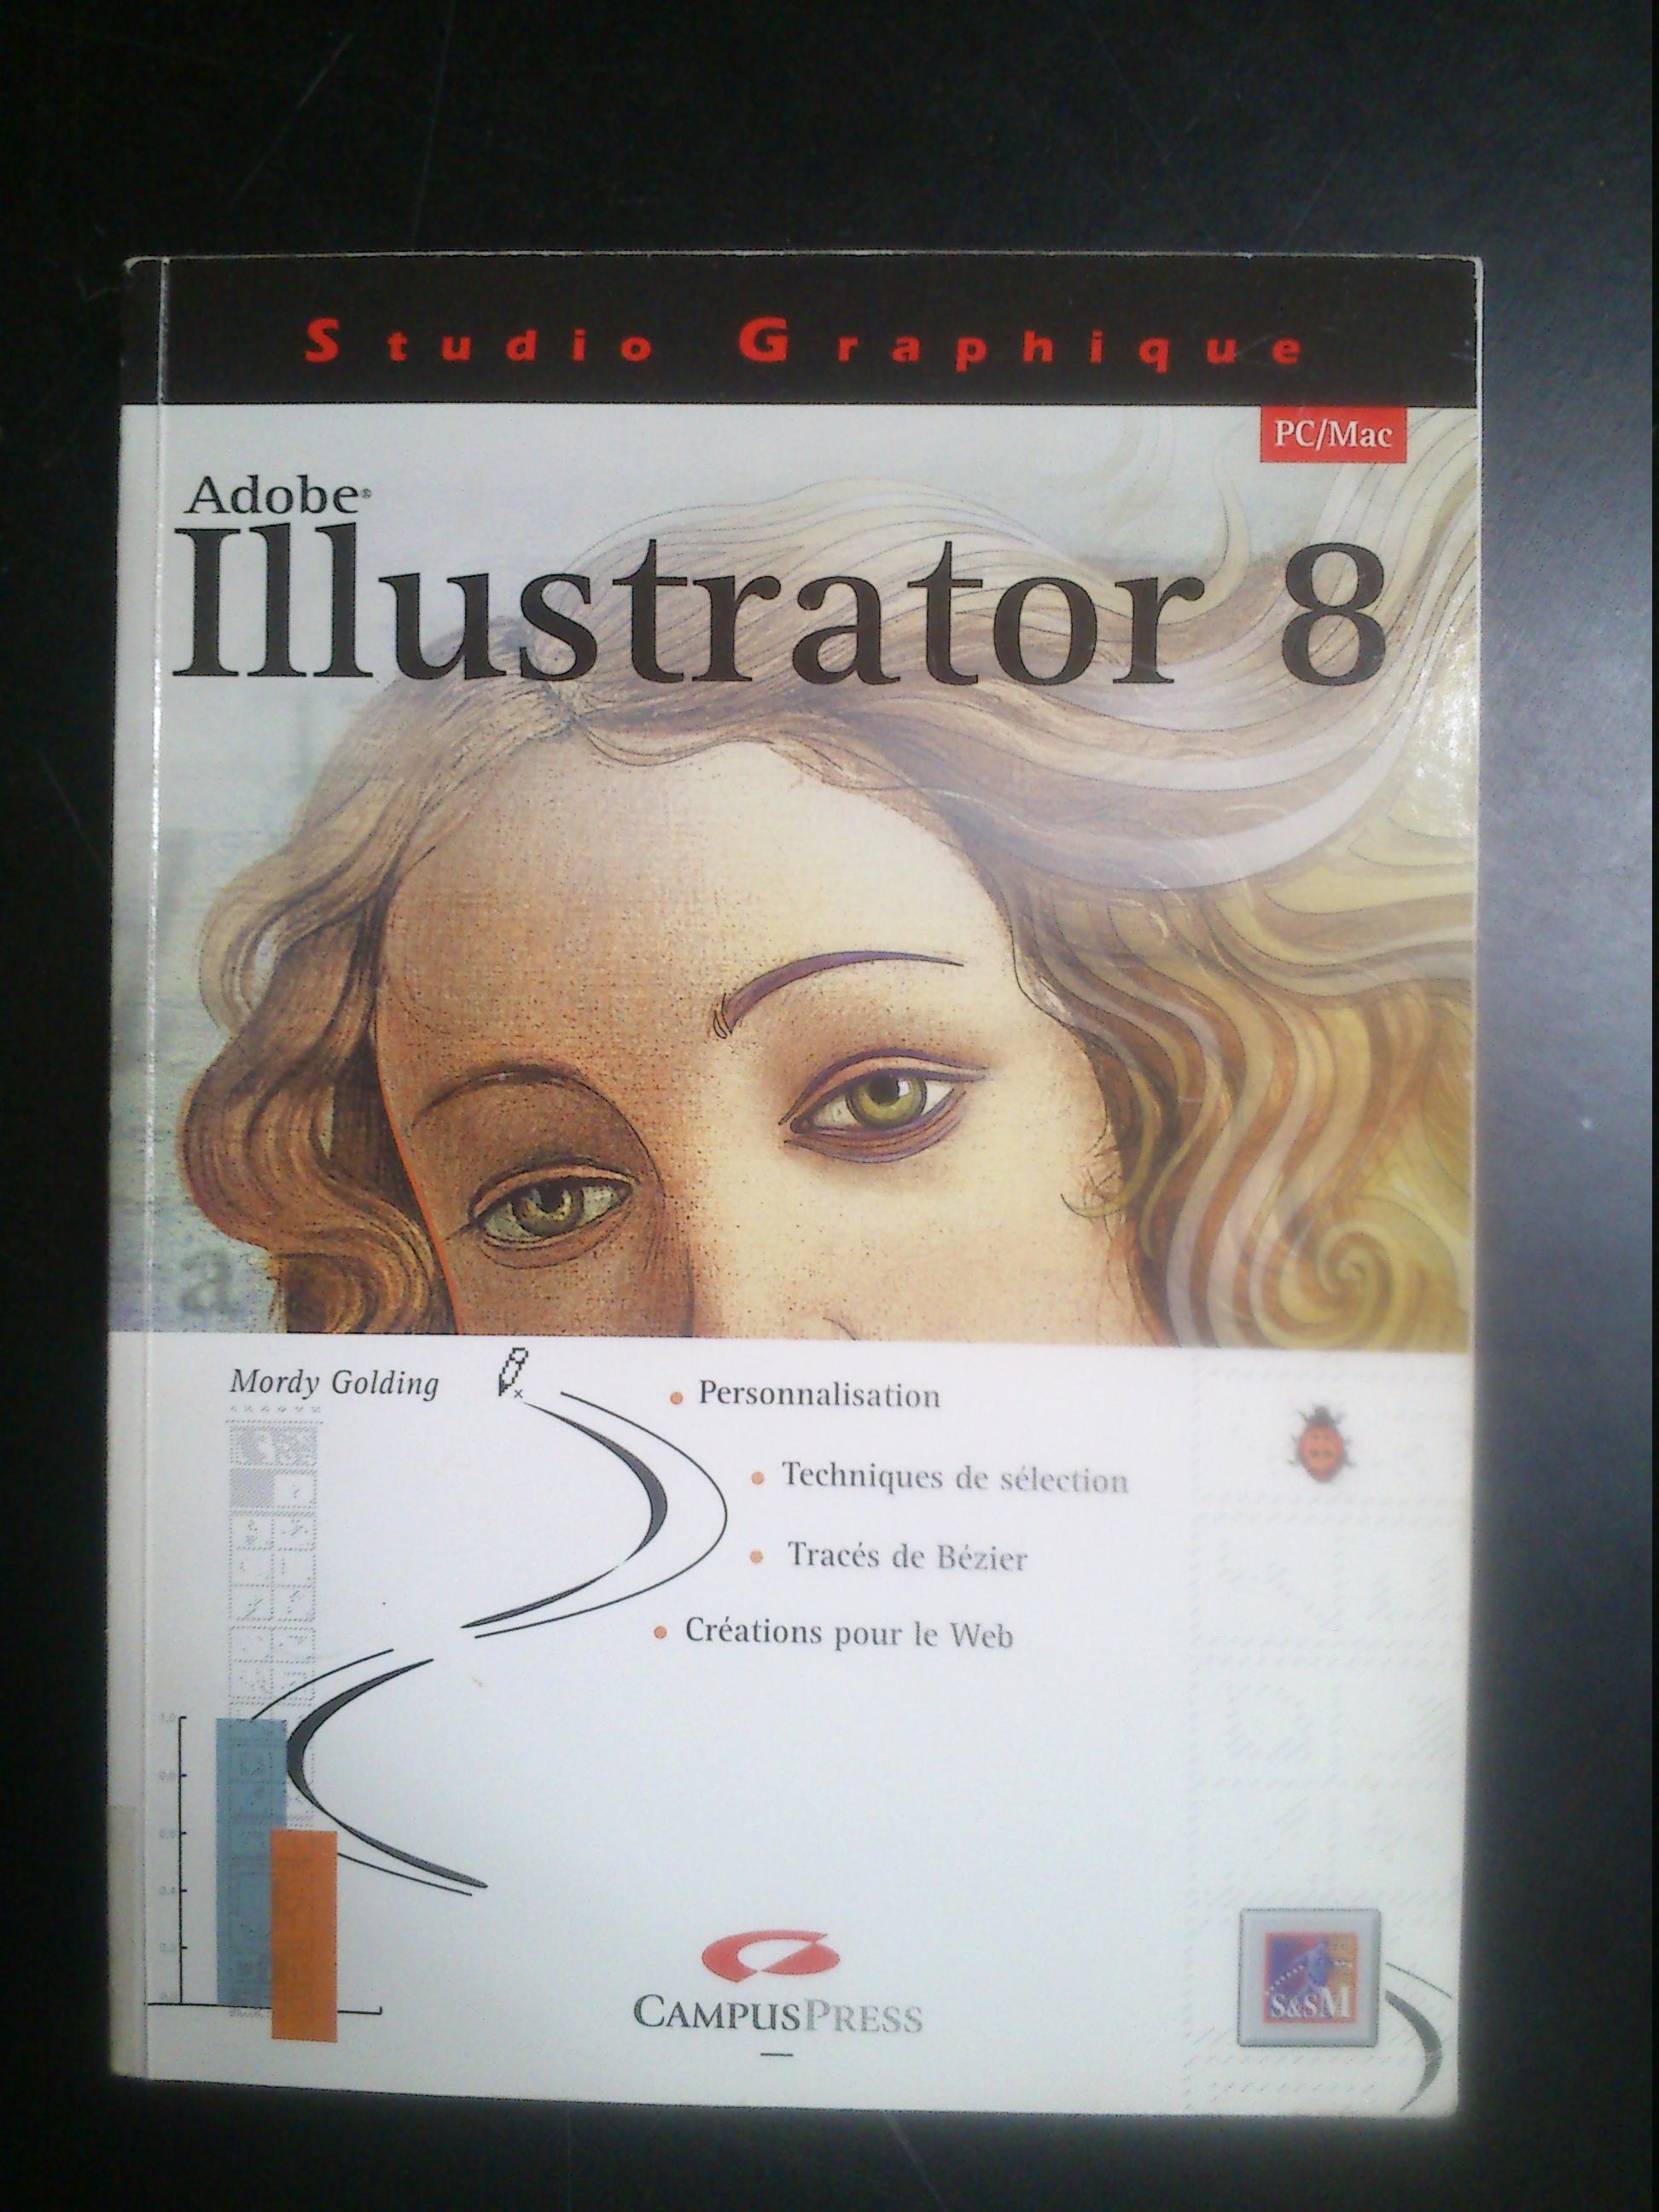 other/photos bibliothèque cambre/covers/DSC_0432.jpg